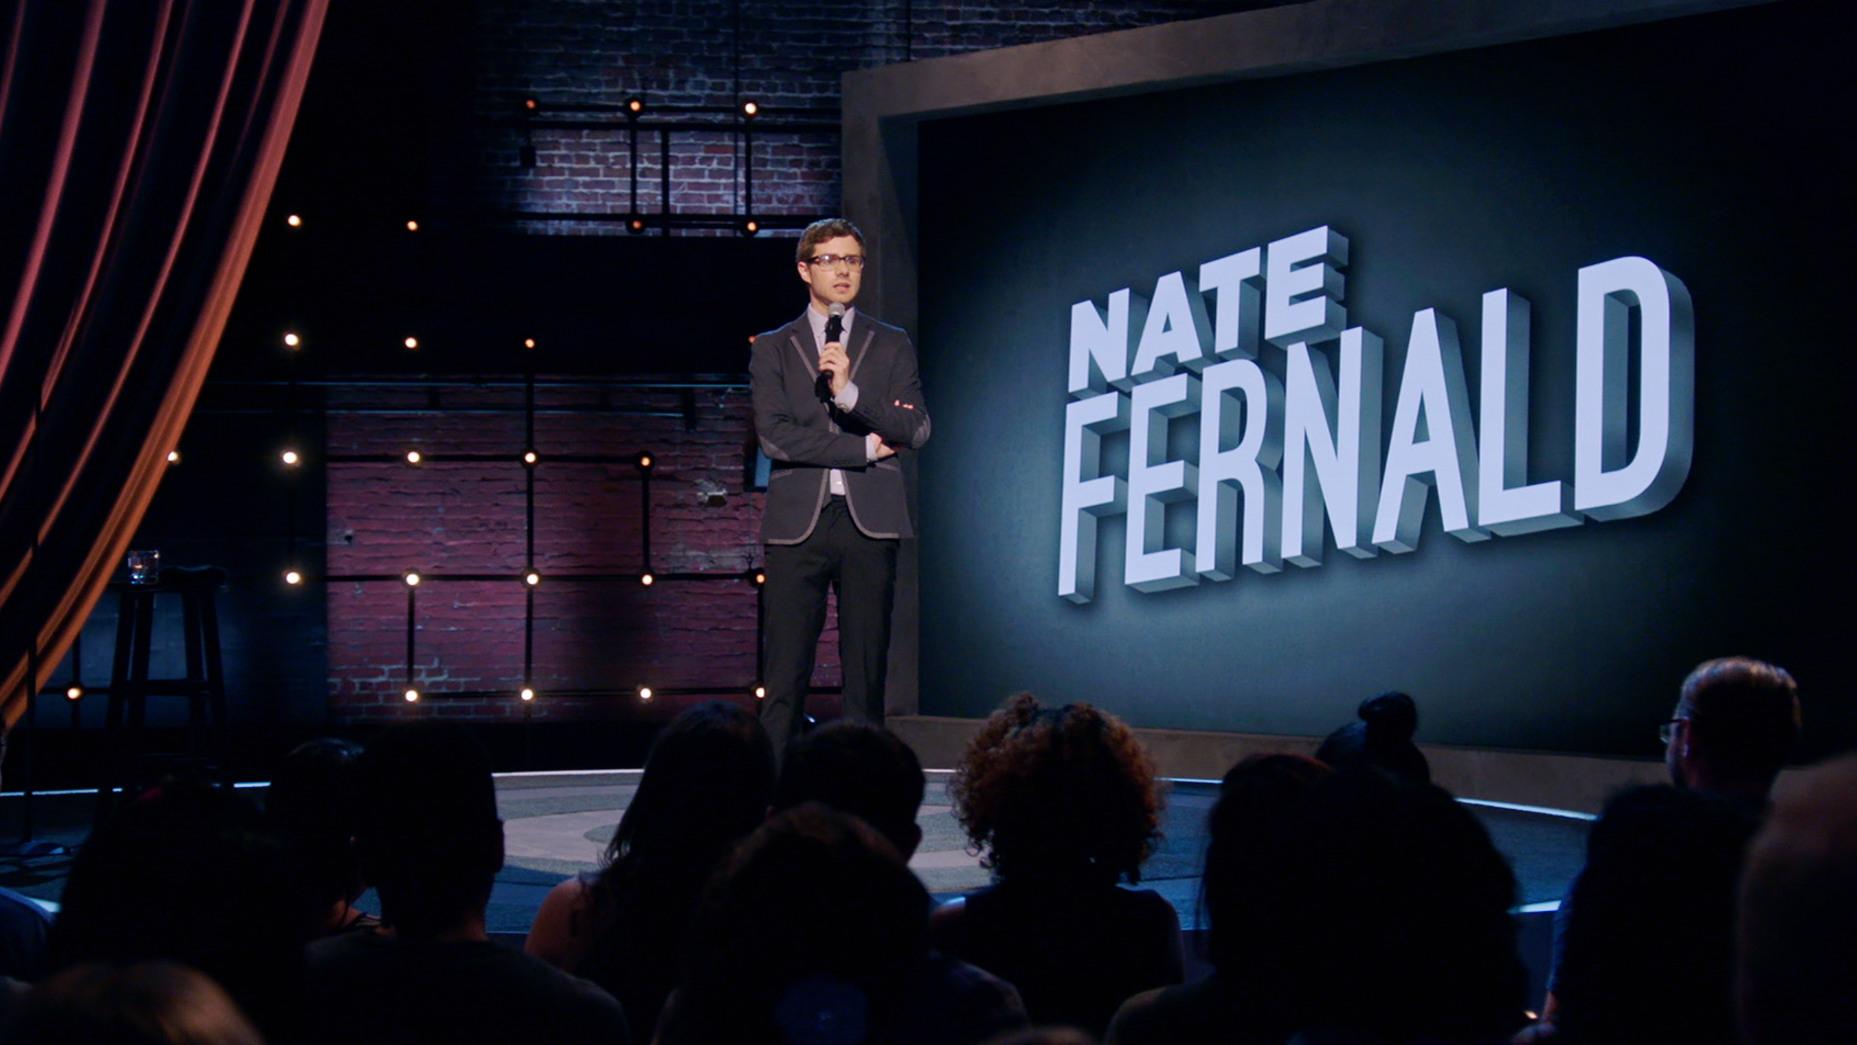 Nate Fernald